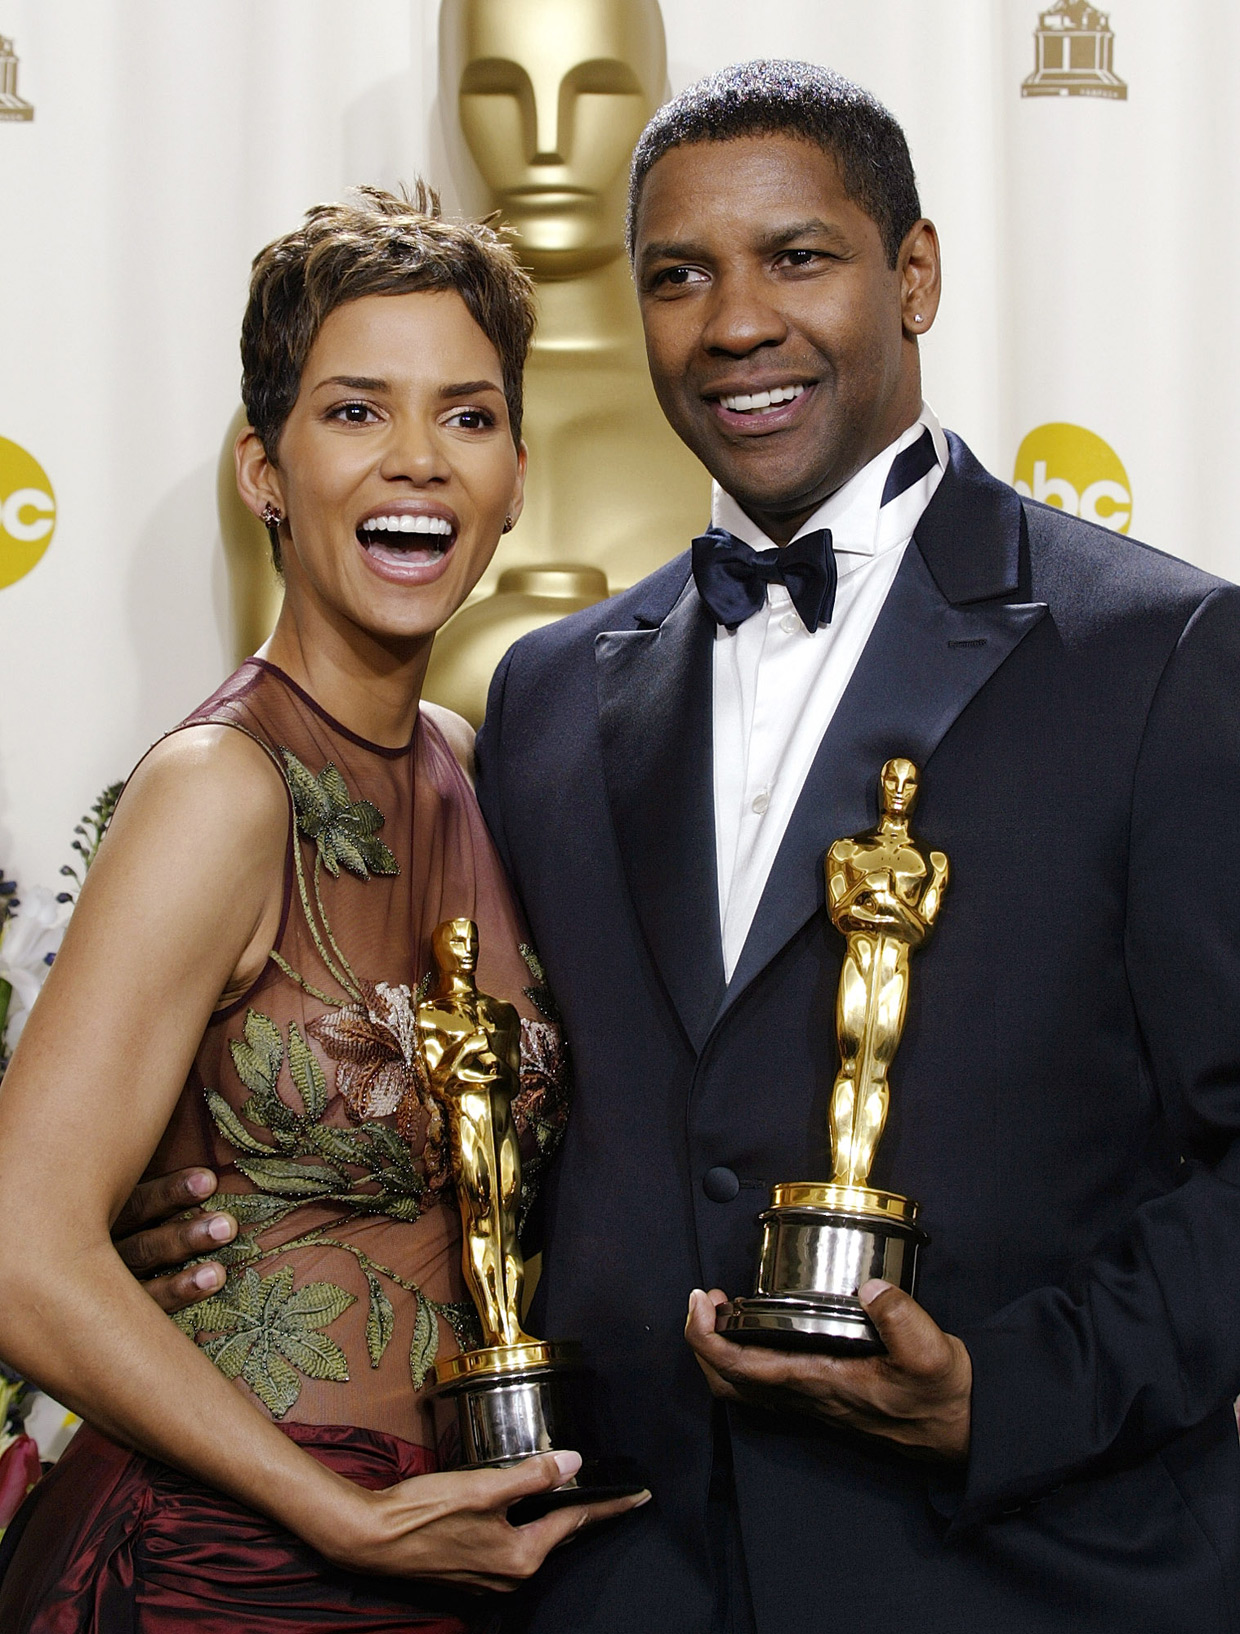 Oscar clipart best actor award Awards Best WLRW 5 the